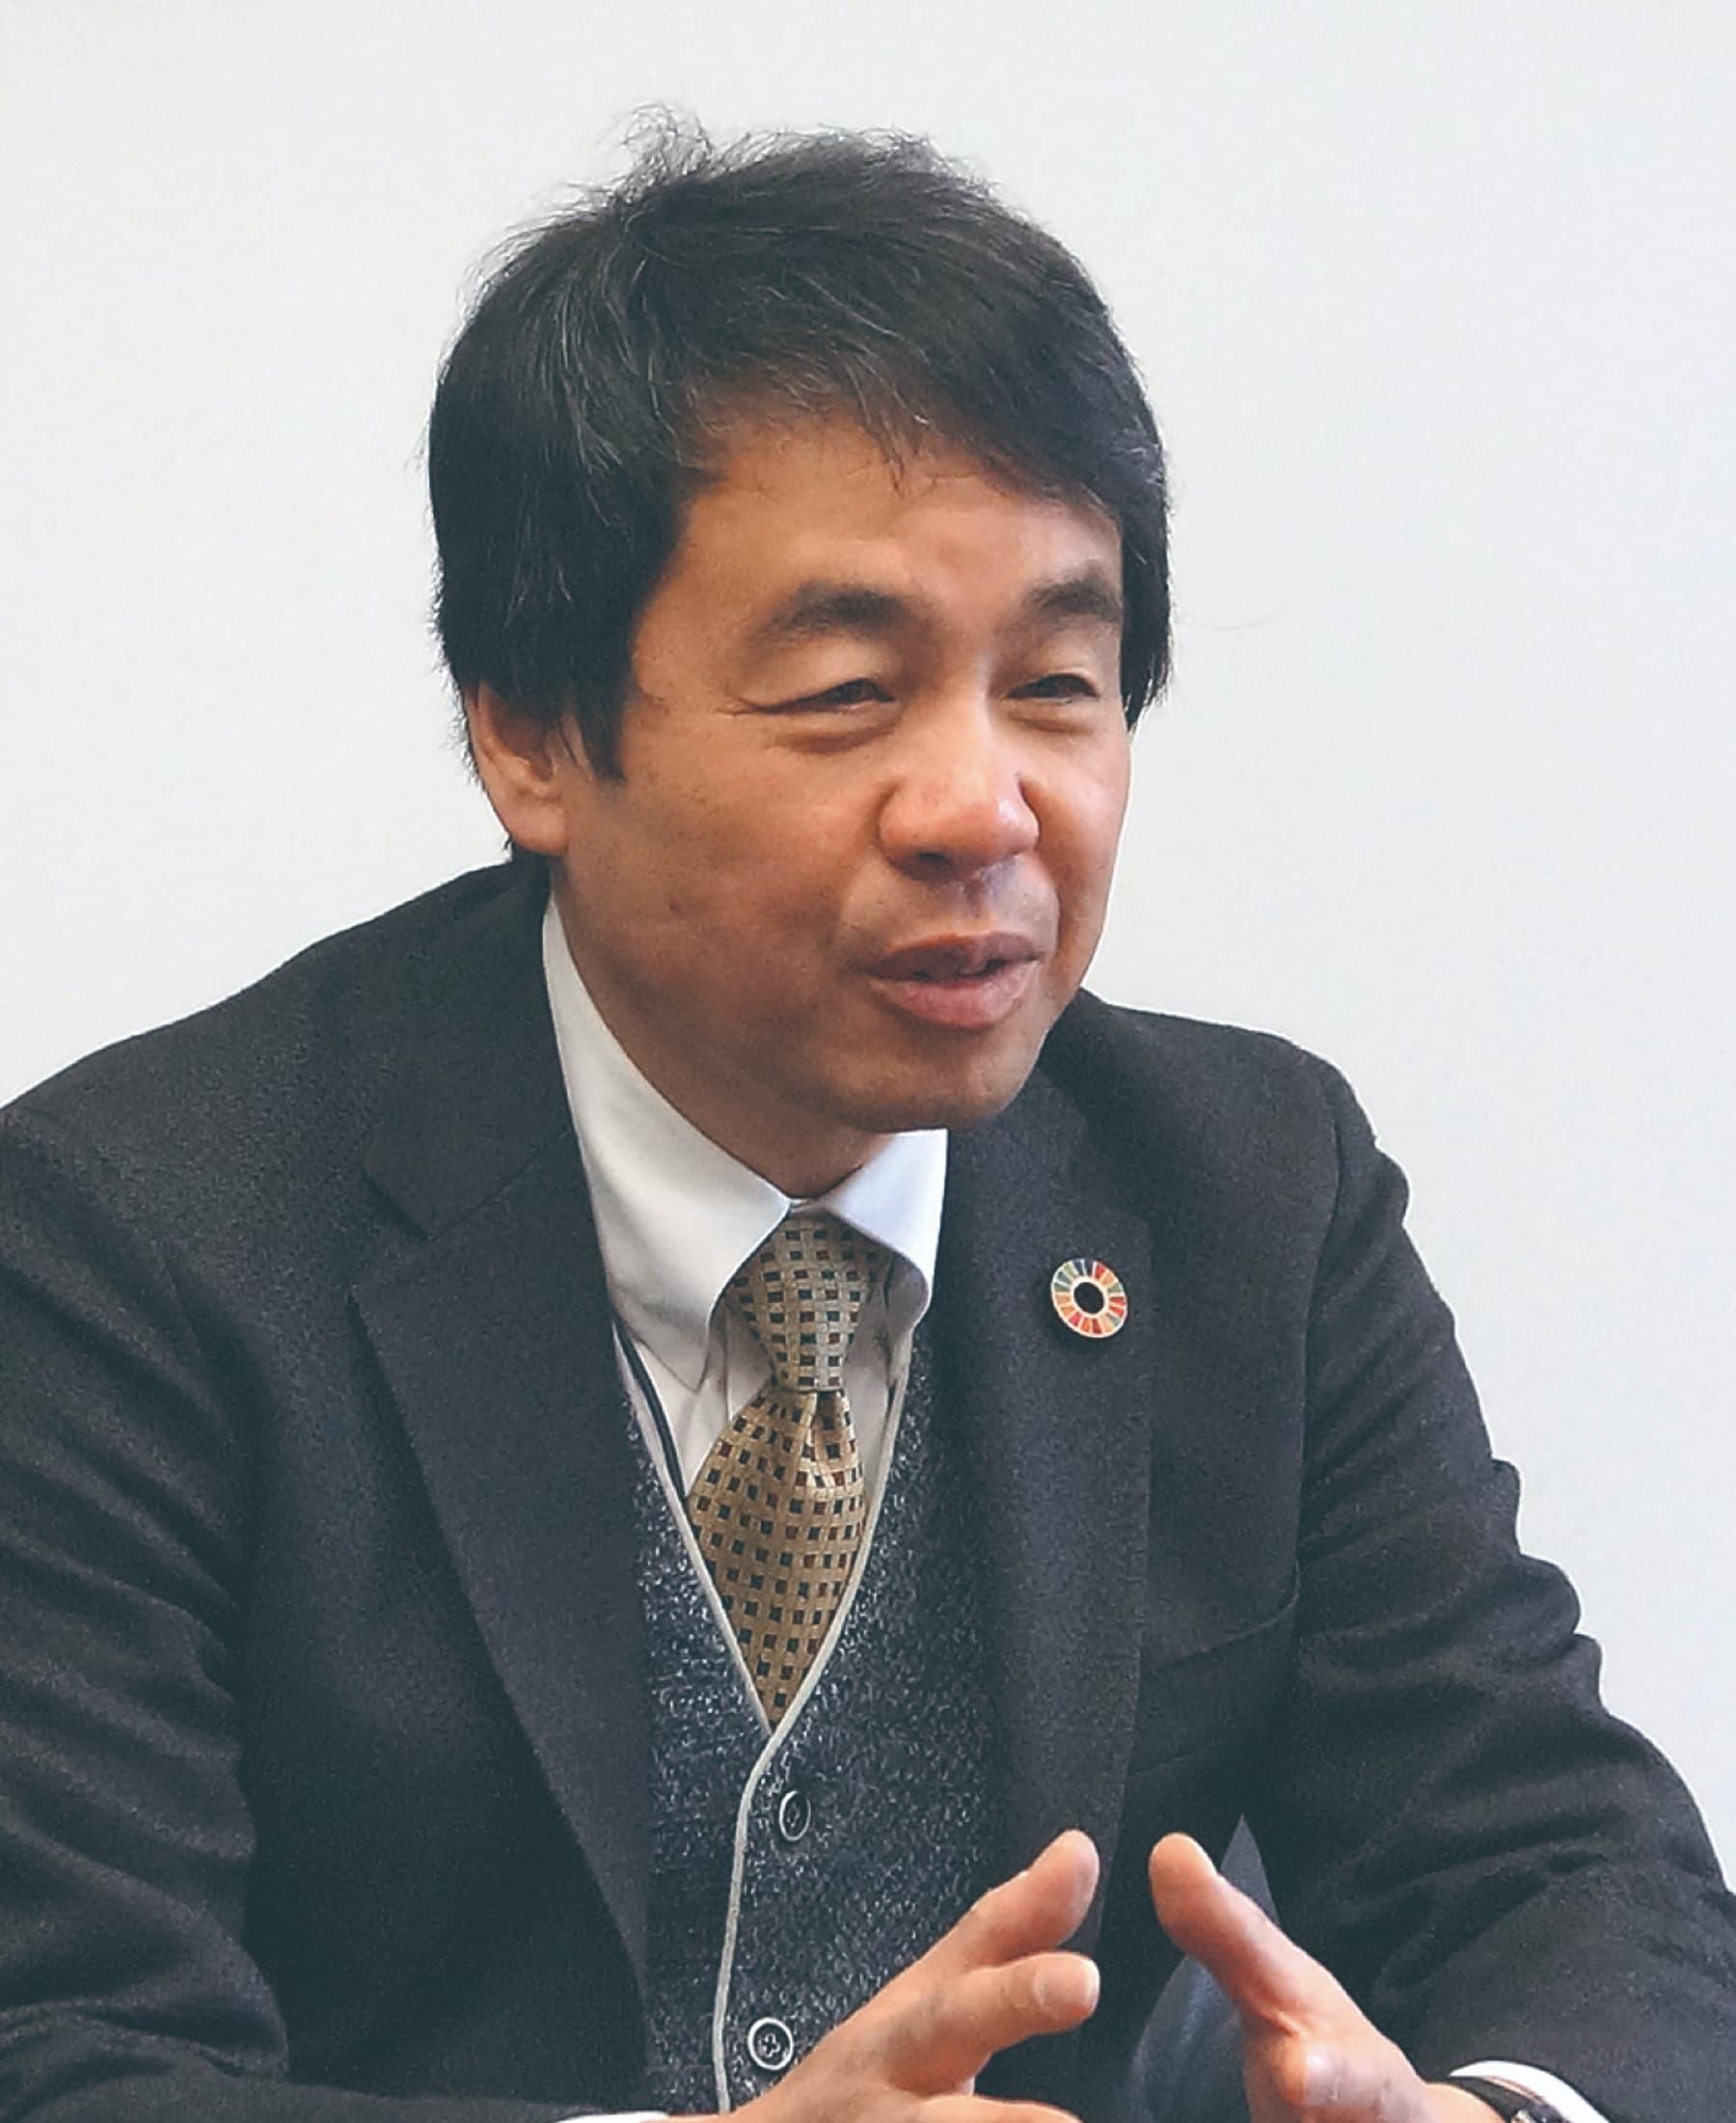 https://course-kagawa.com/wp-content/uploads/2020/03/sugagumi_02.jpg